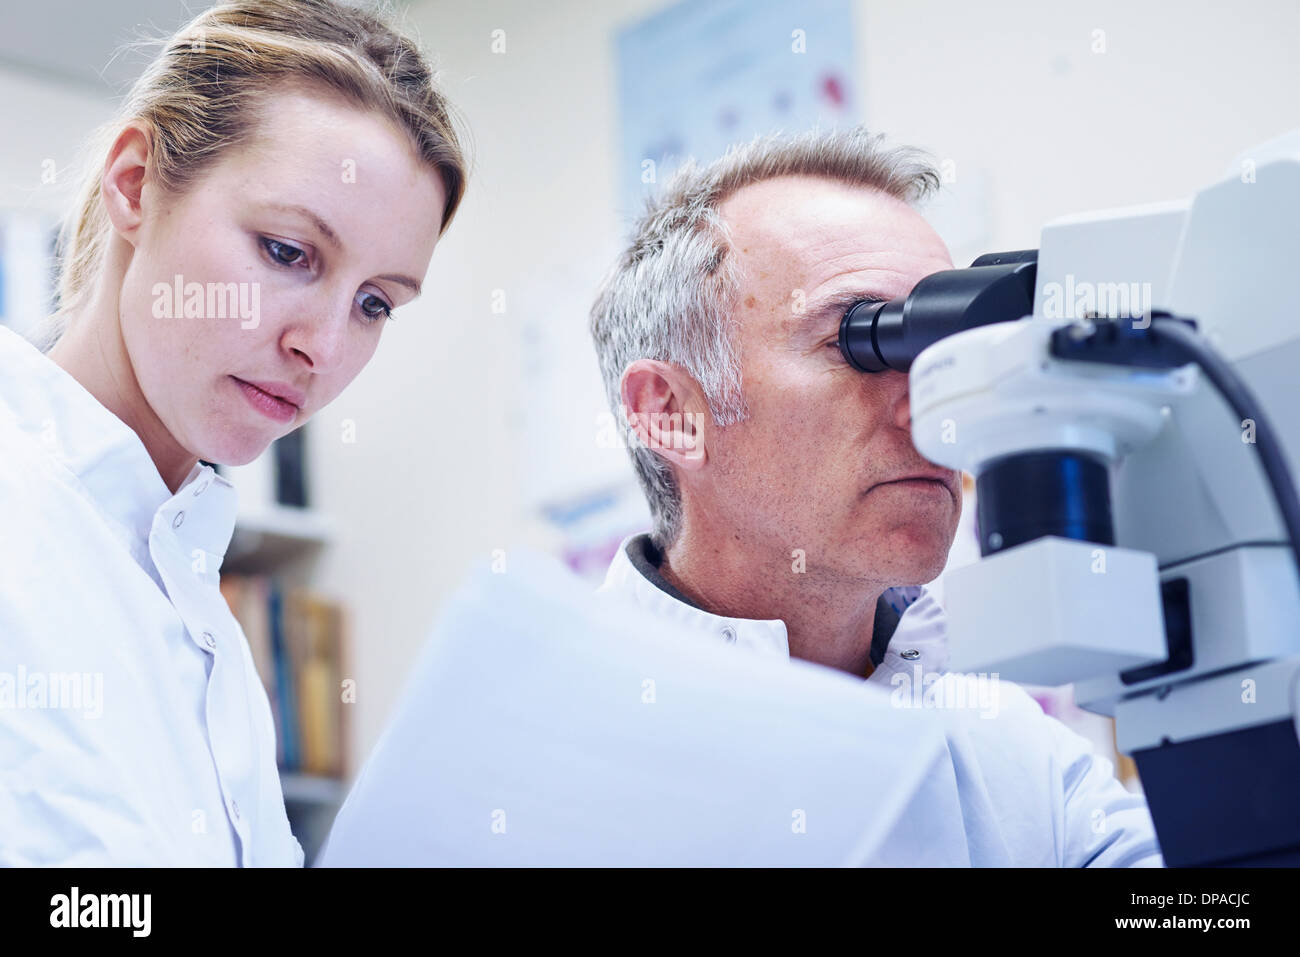 Man looking through microscope, woman looking at paperwork - Stock Image